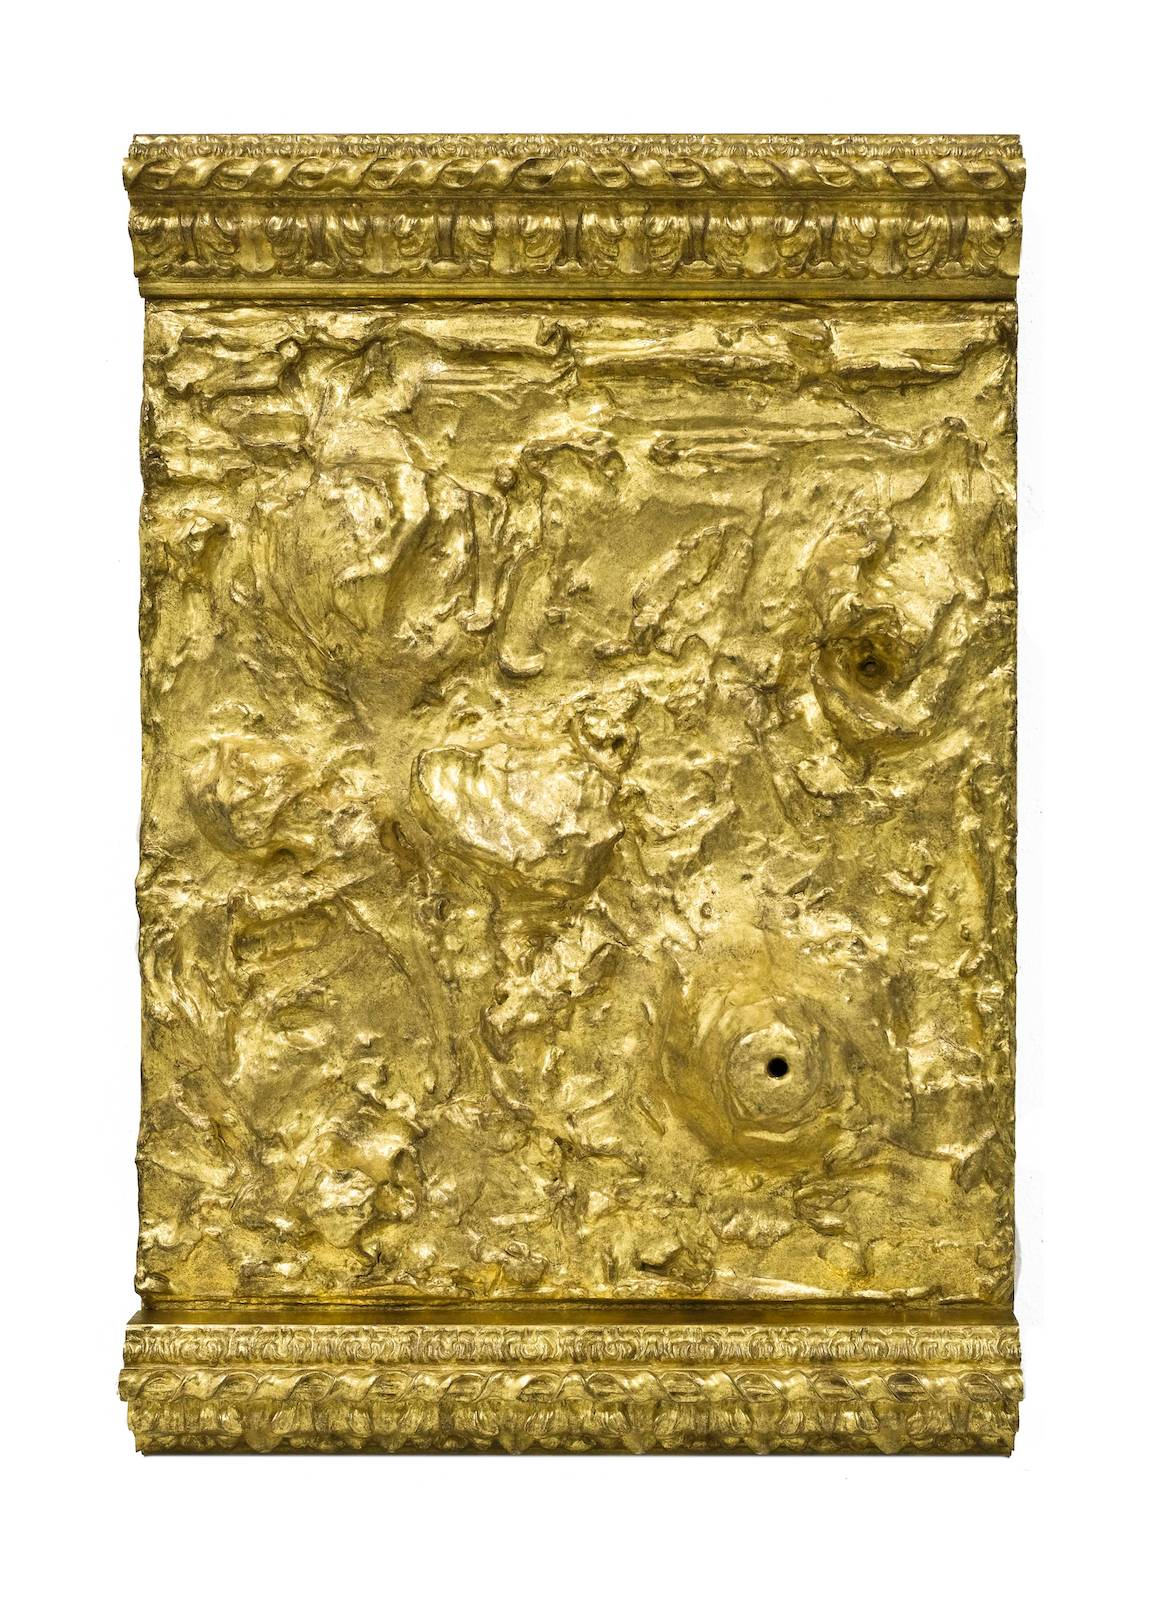 Untitled, 2017, wood, acrylic paste, gold leaf, 74 x 50 x 15 cm